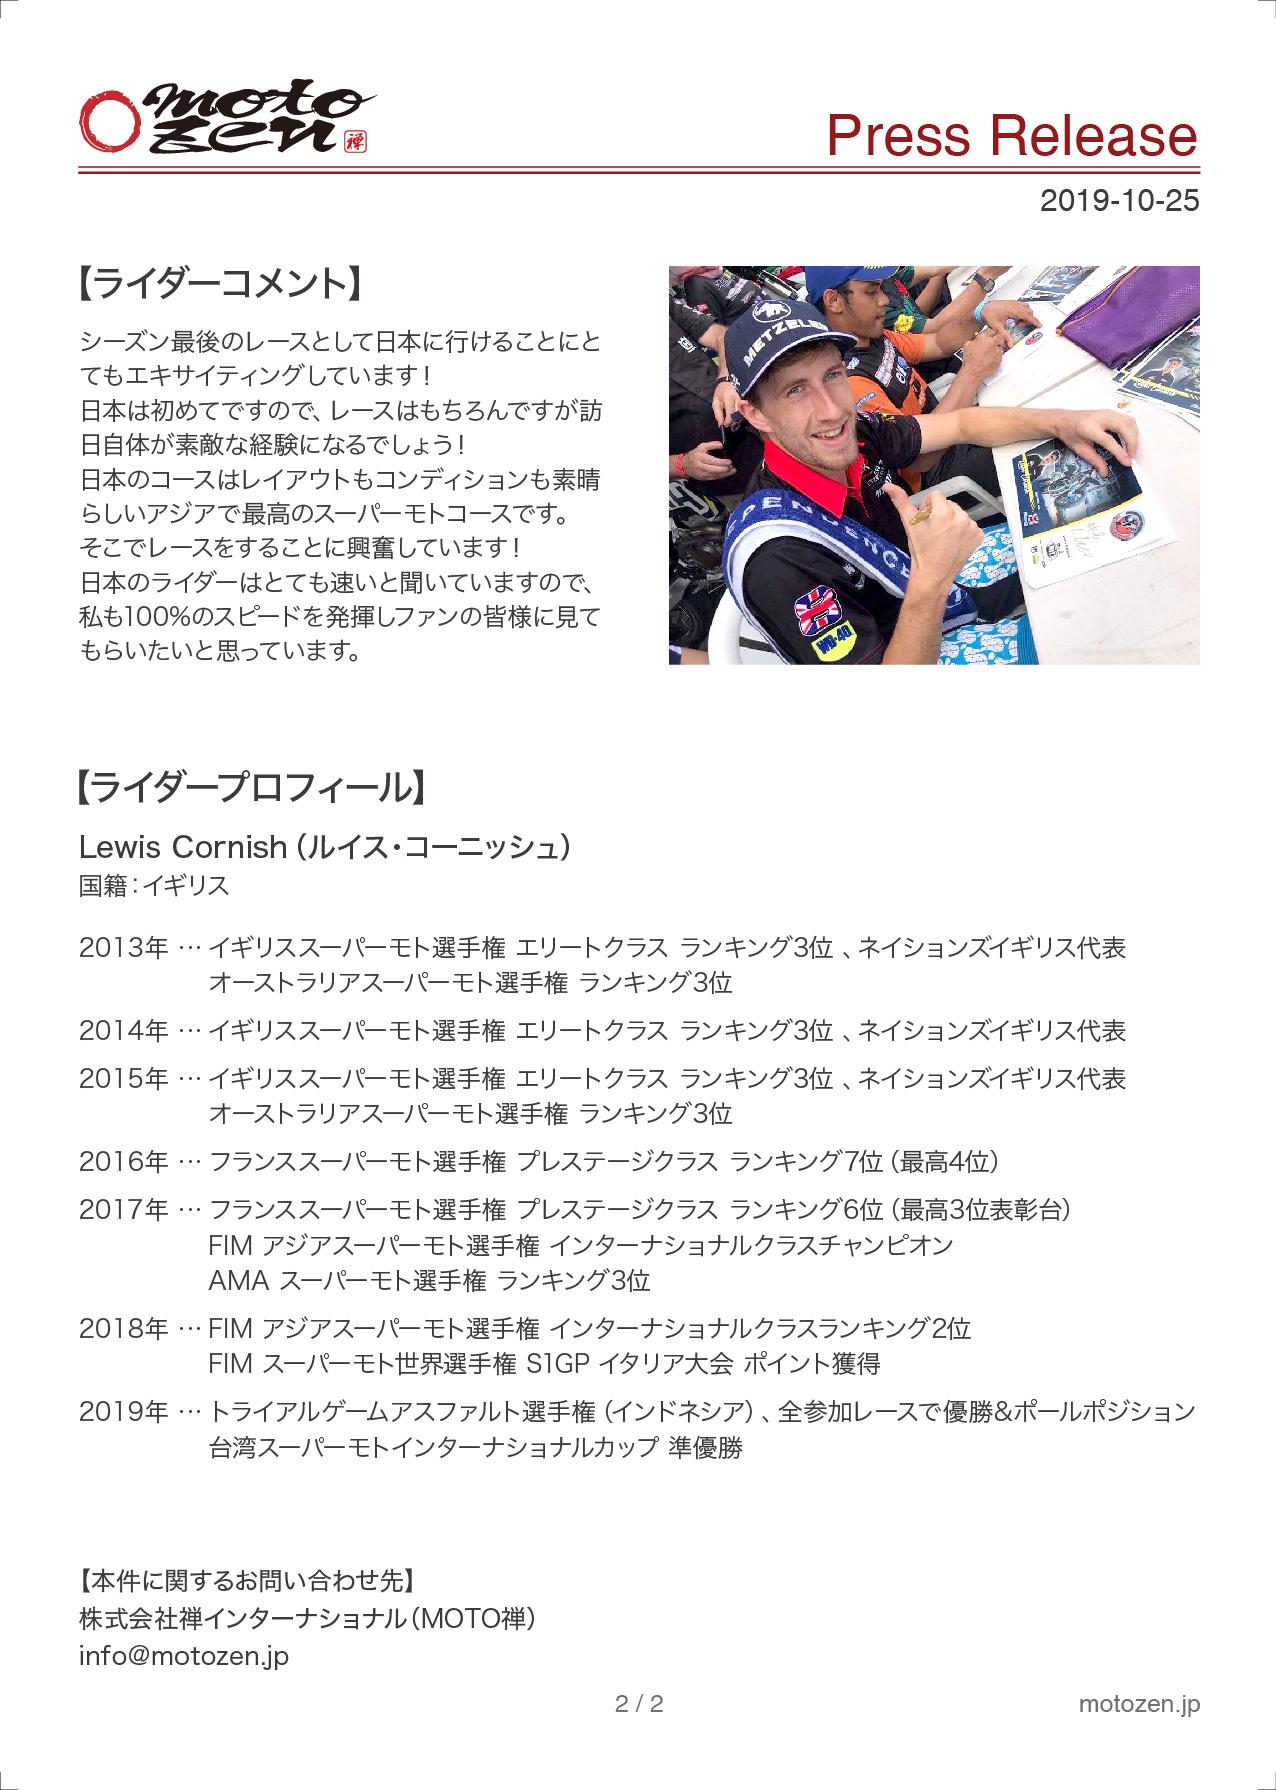 moto禅プレスリリース SMJ R8 ルイスコーニッシュ参戦